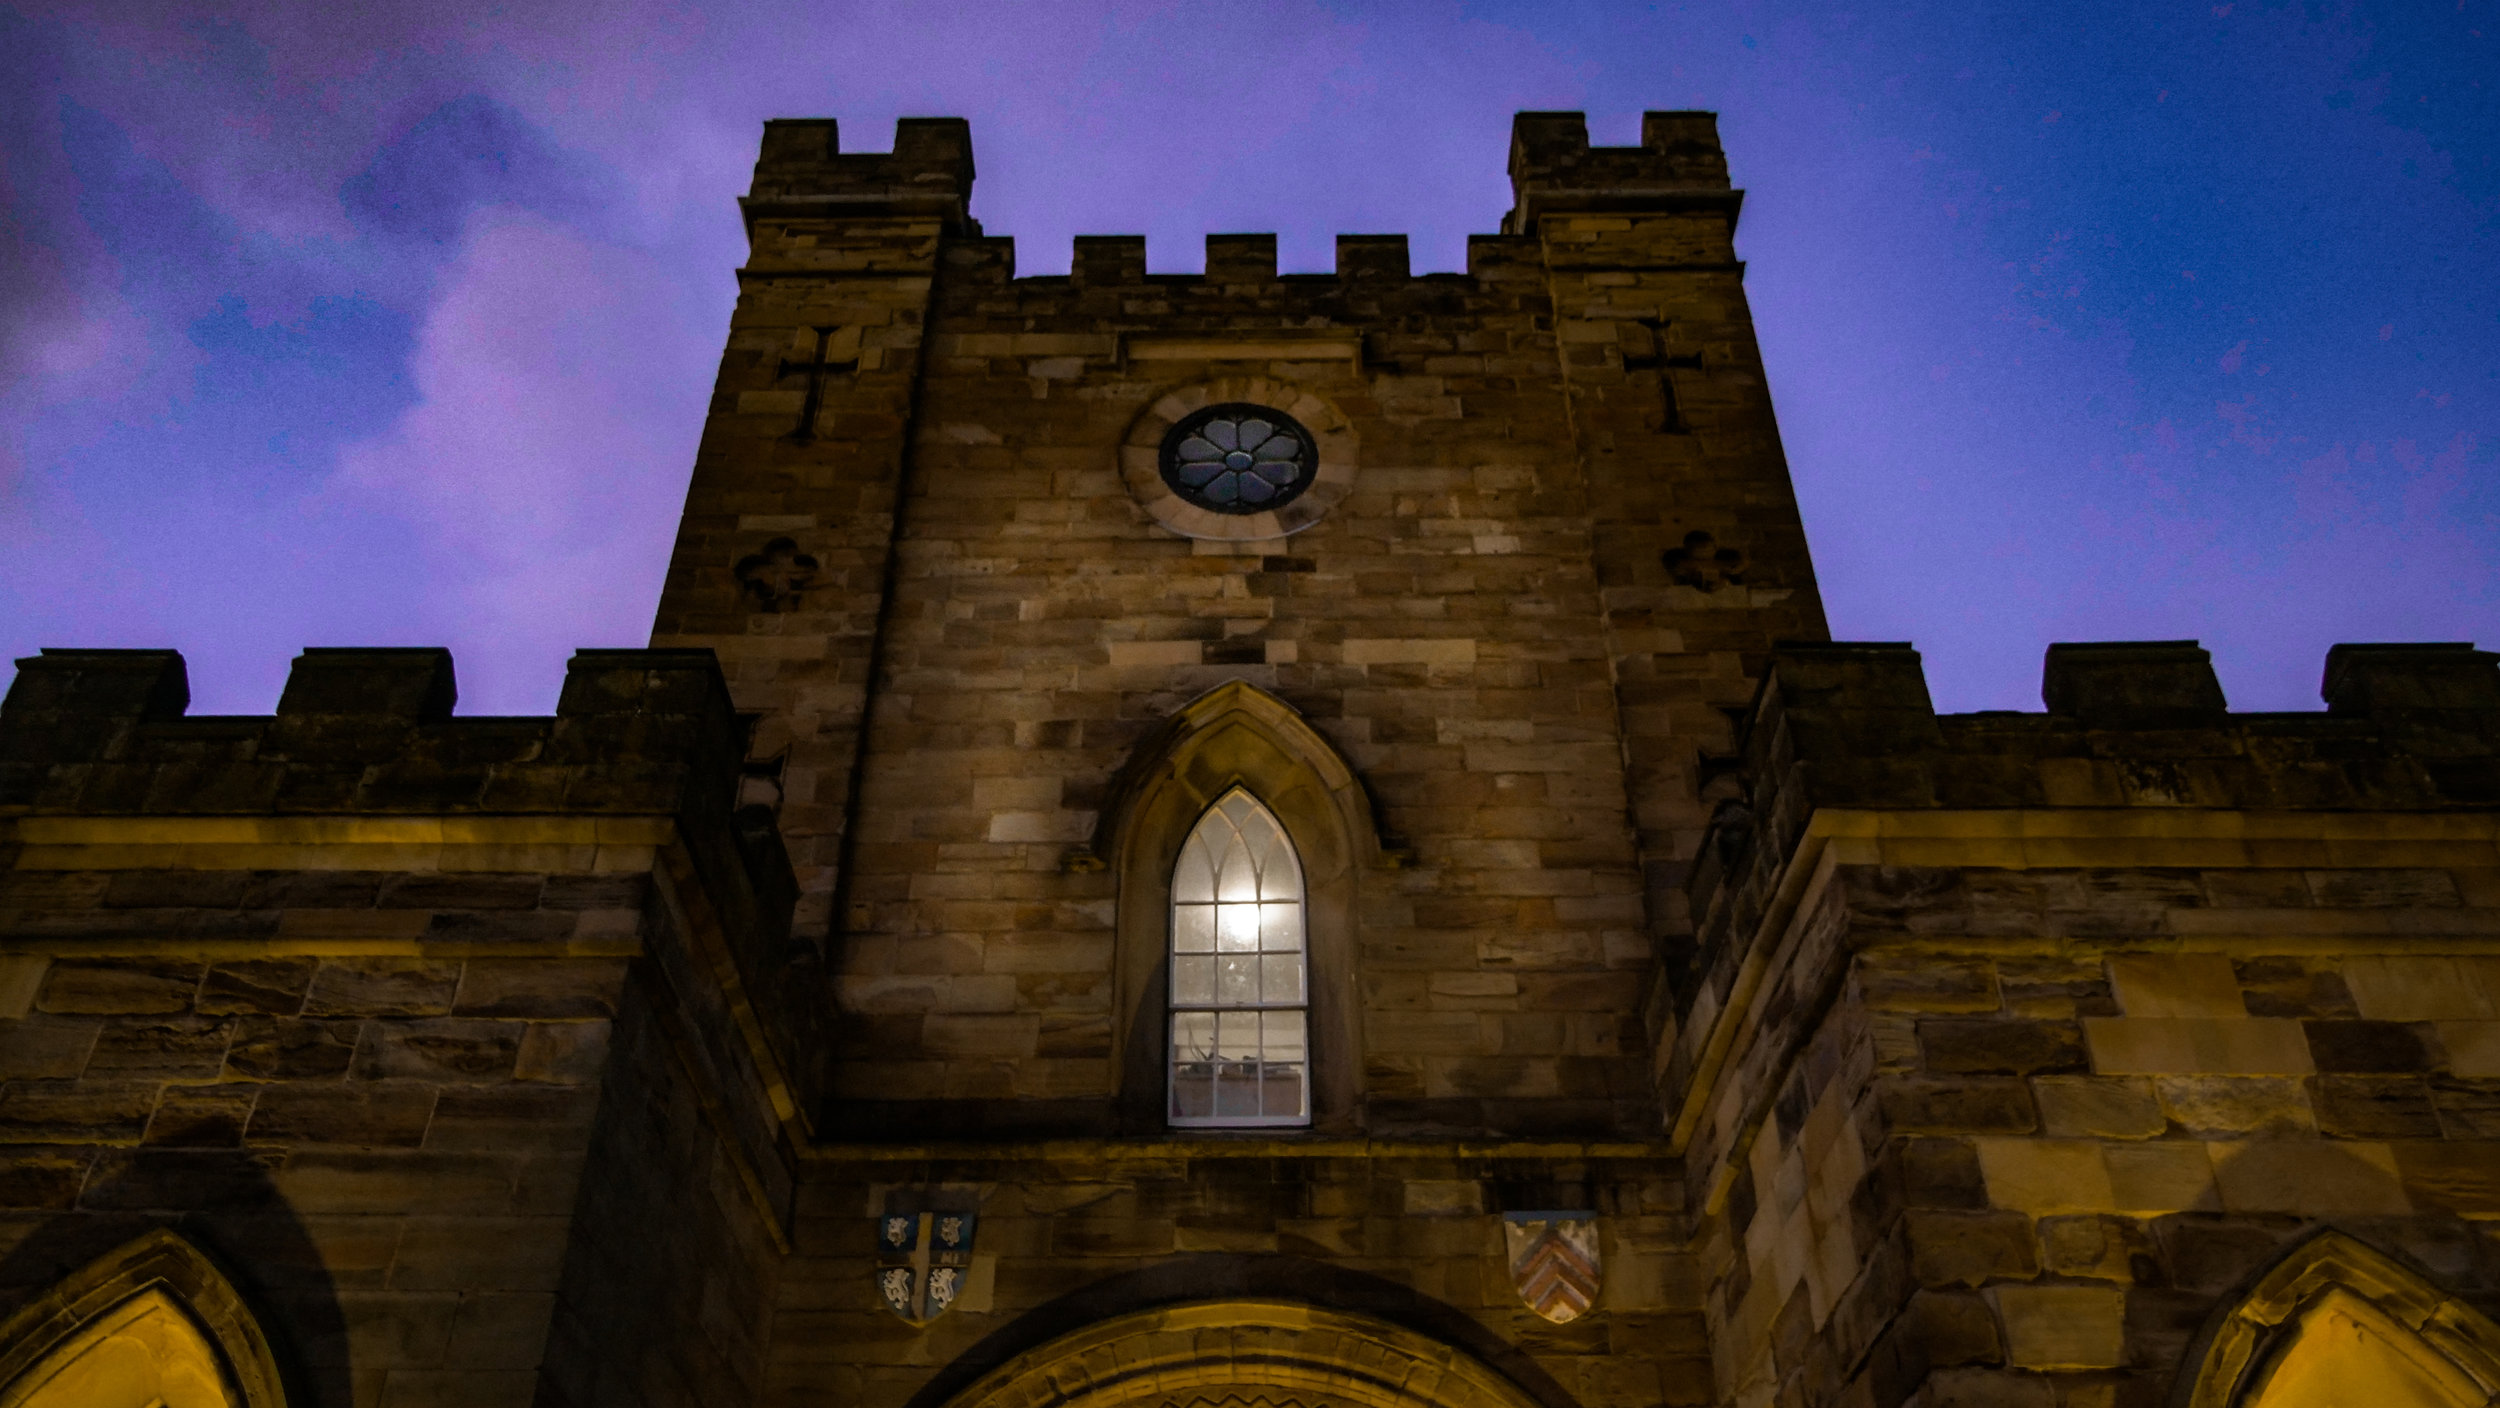 Durham's historic castle